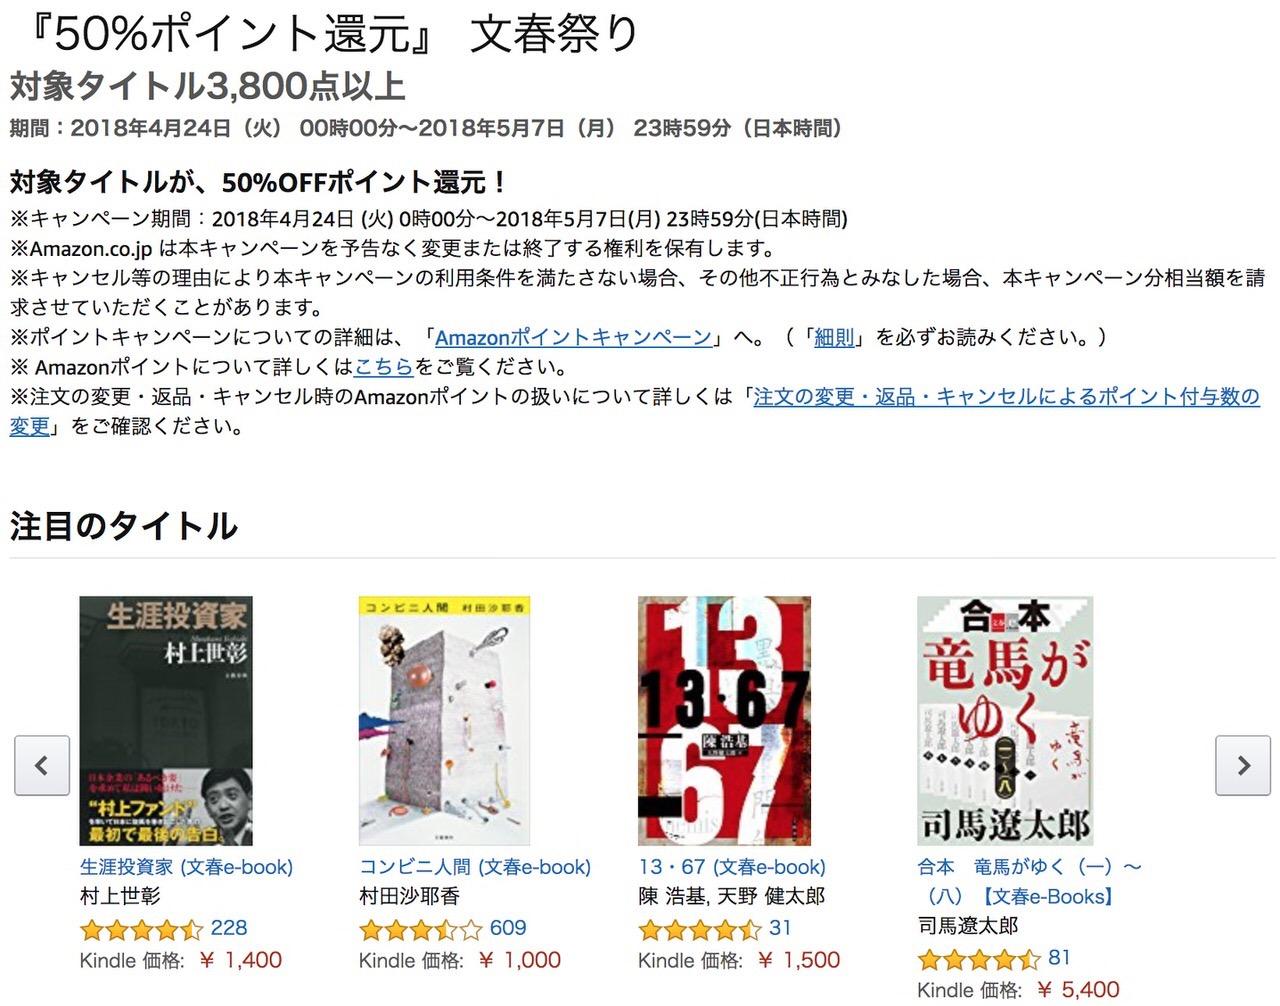 【Kindleセール】3,800冊以上が対象!50%ポイント還元「文春祭り」(5/7まで)